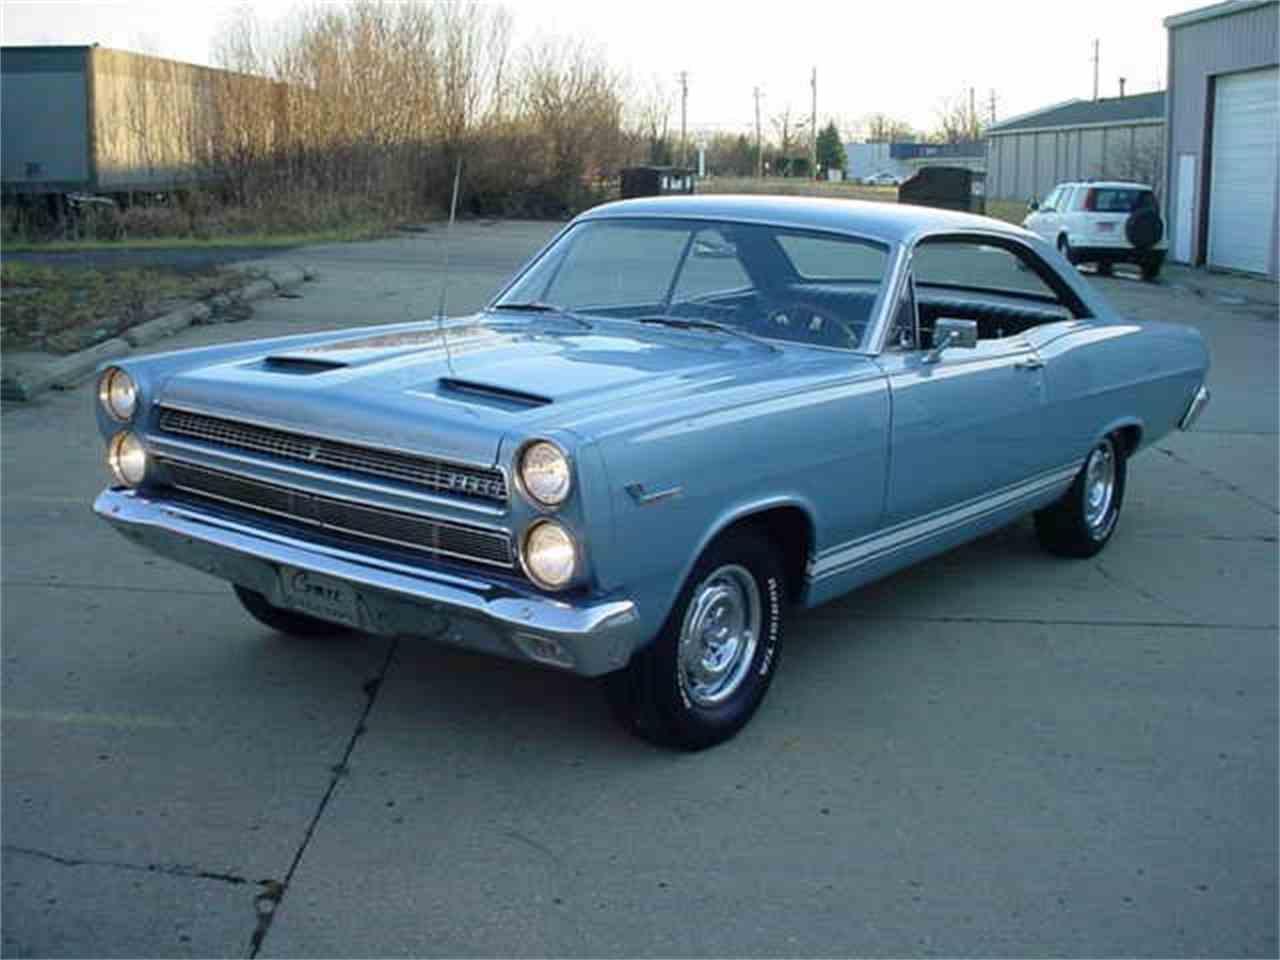 1966 Mercury Cyclone GT for Sale | ClassicCars.com | CC-1031563